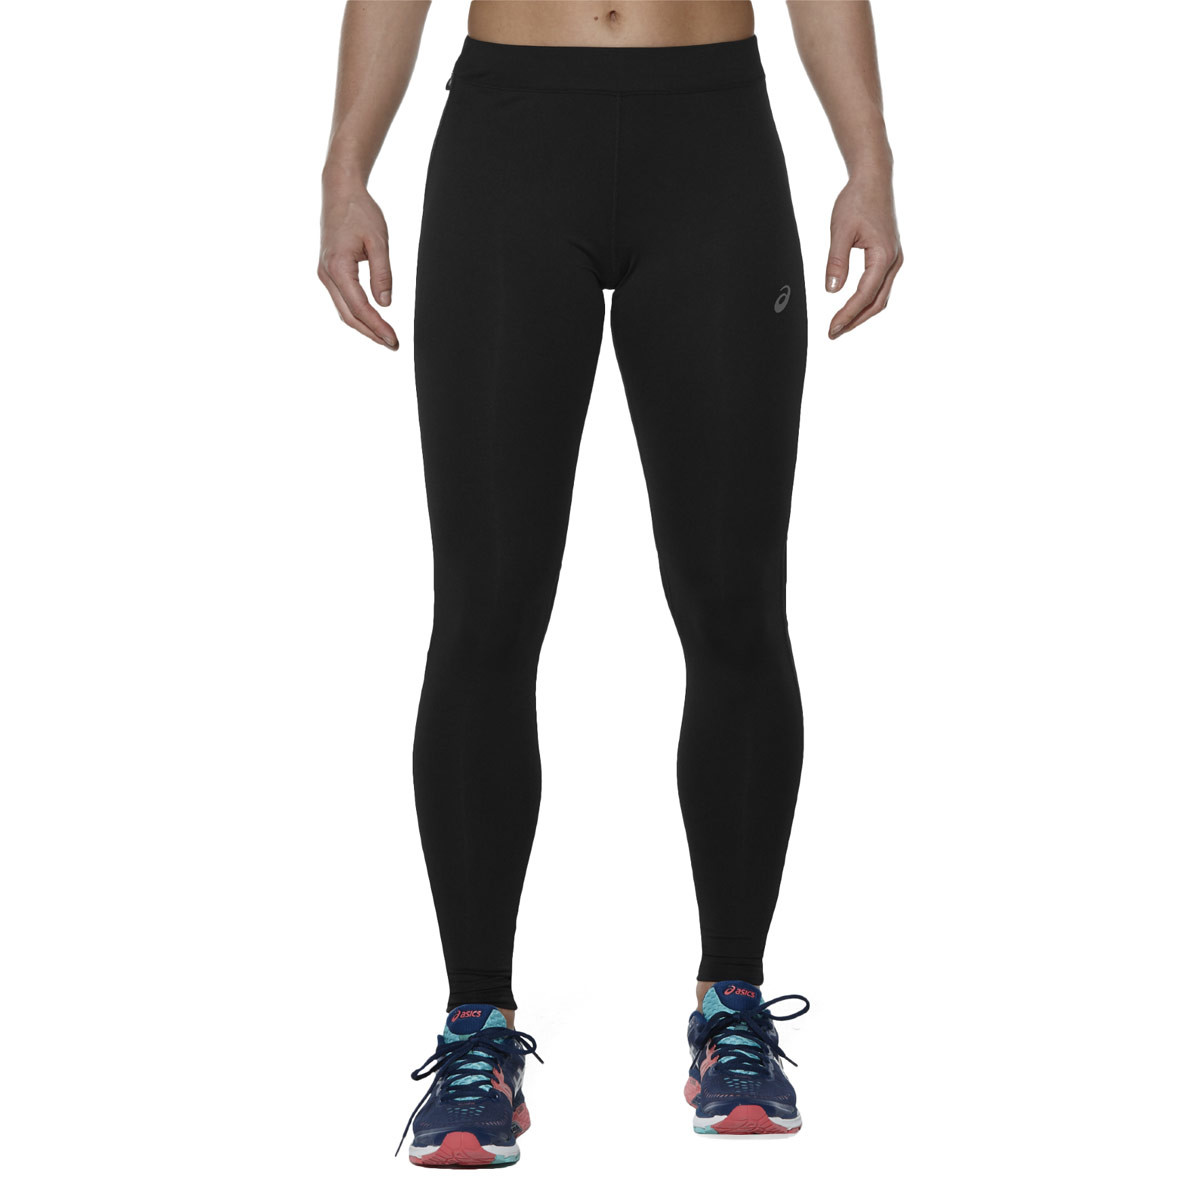 5bfc60c9450ced ASICS Tight - Running trousers for Women - Black | 21RUN